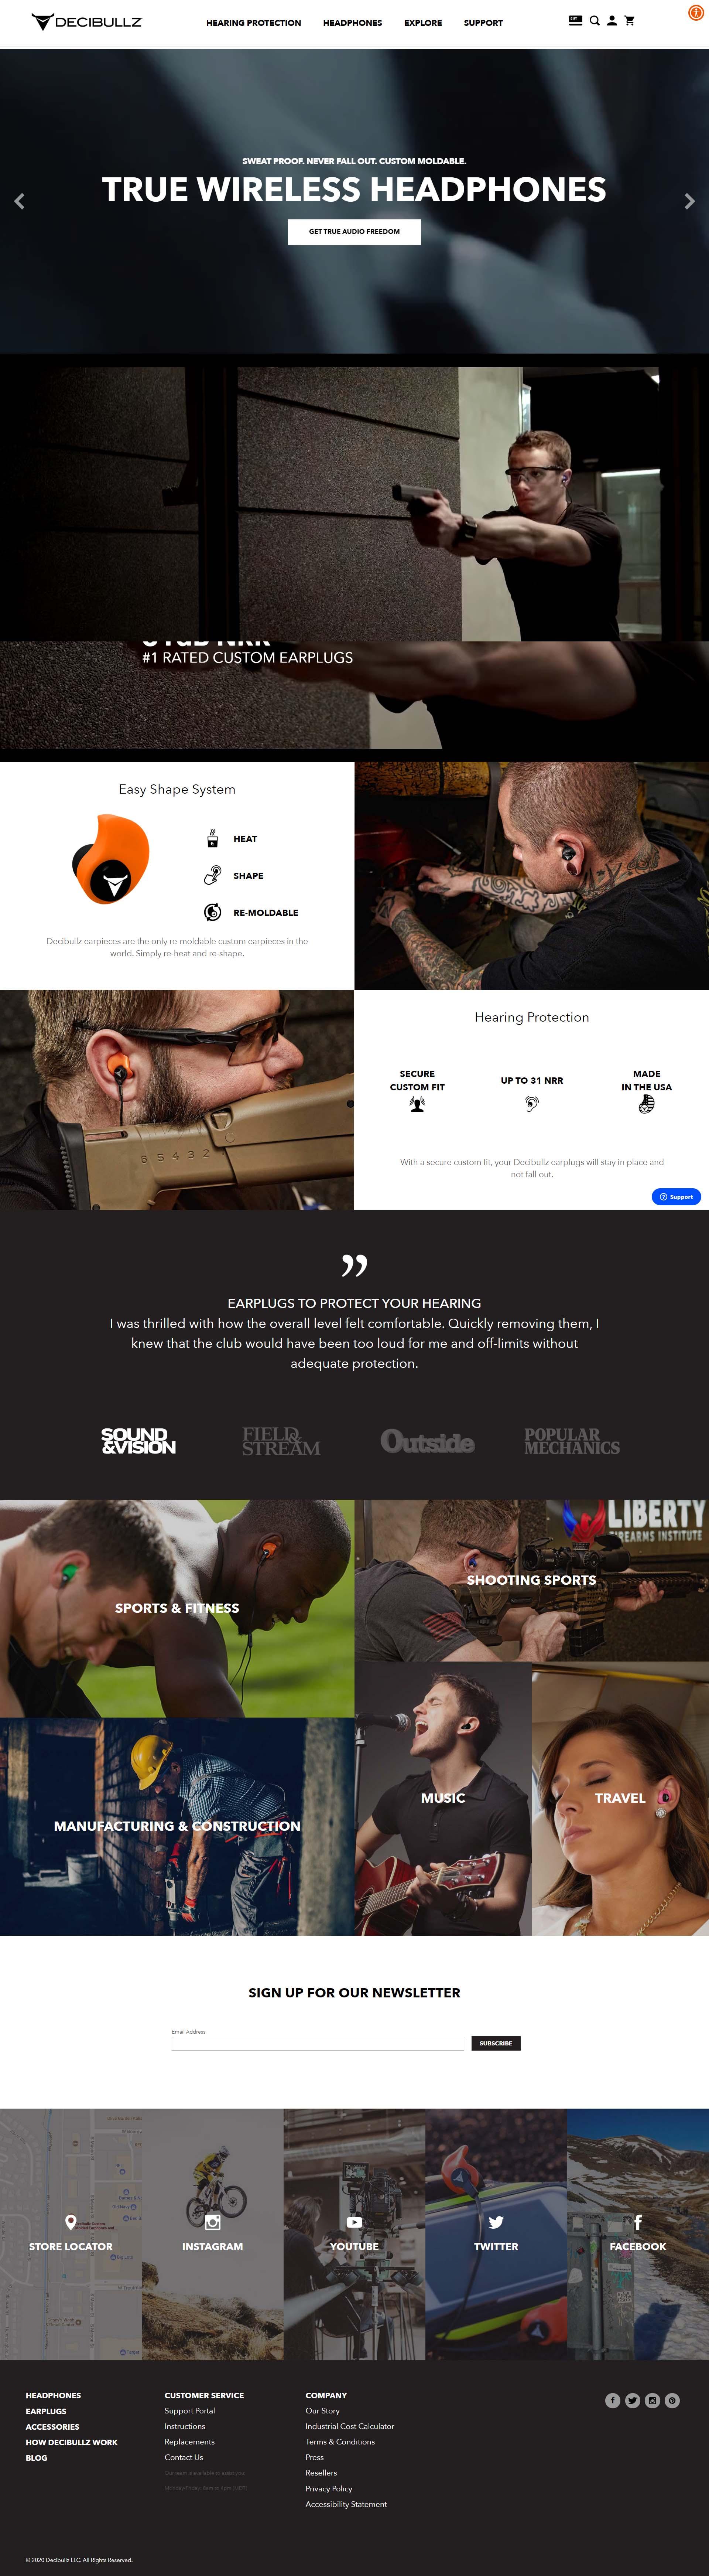 Previous Consumer Goods Website Design Example